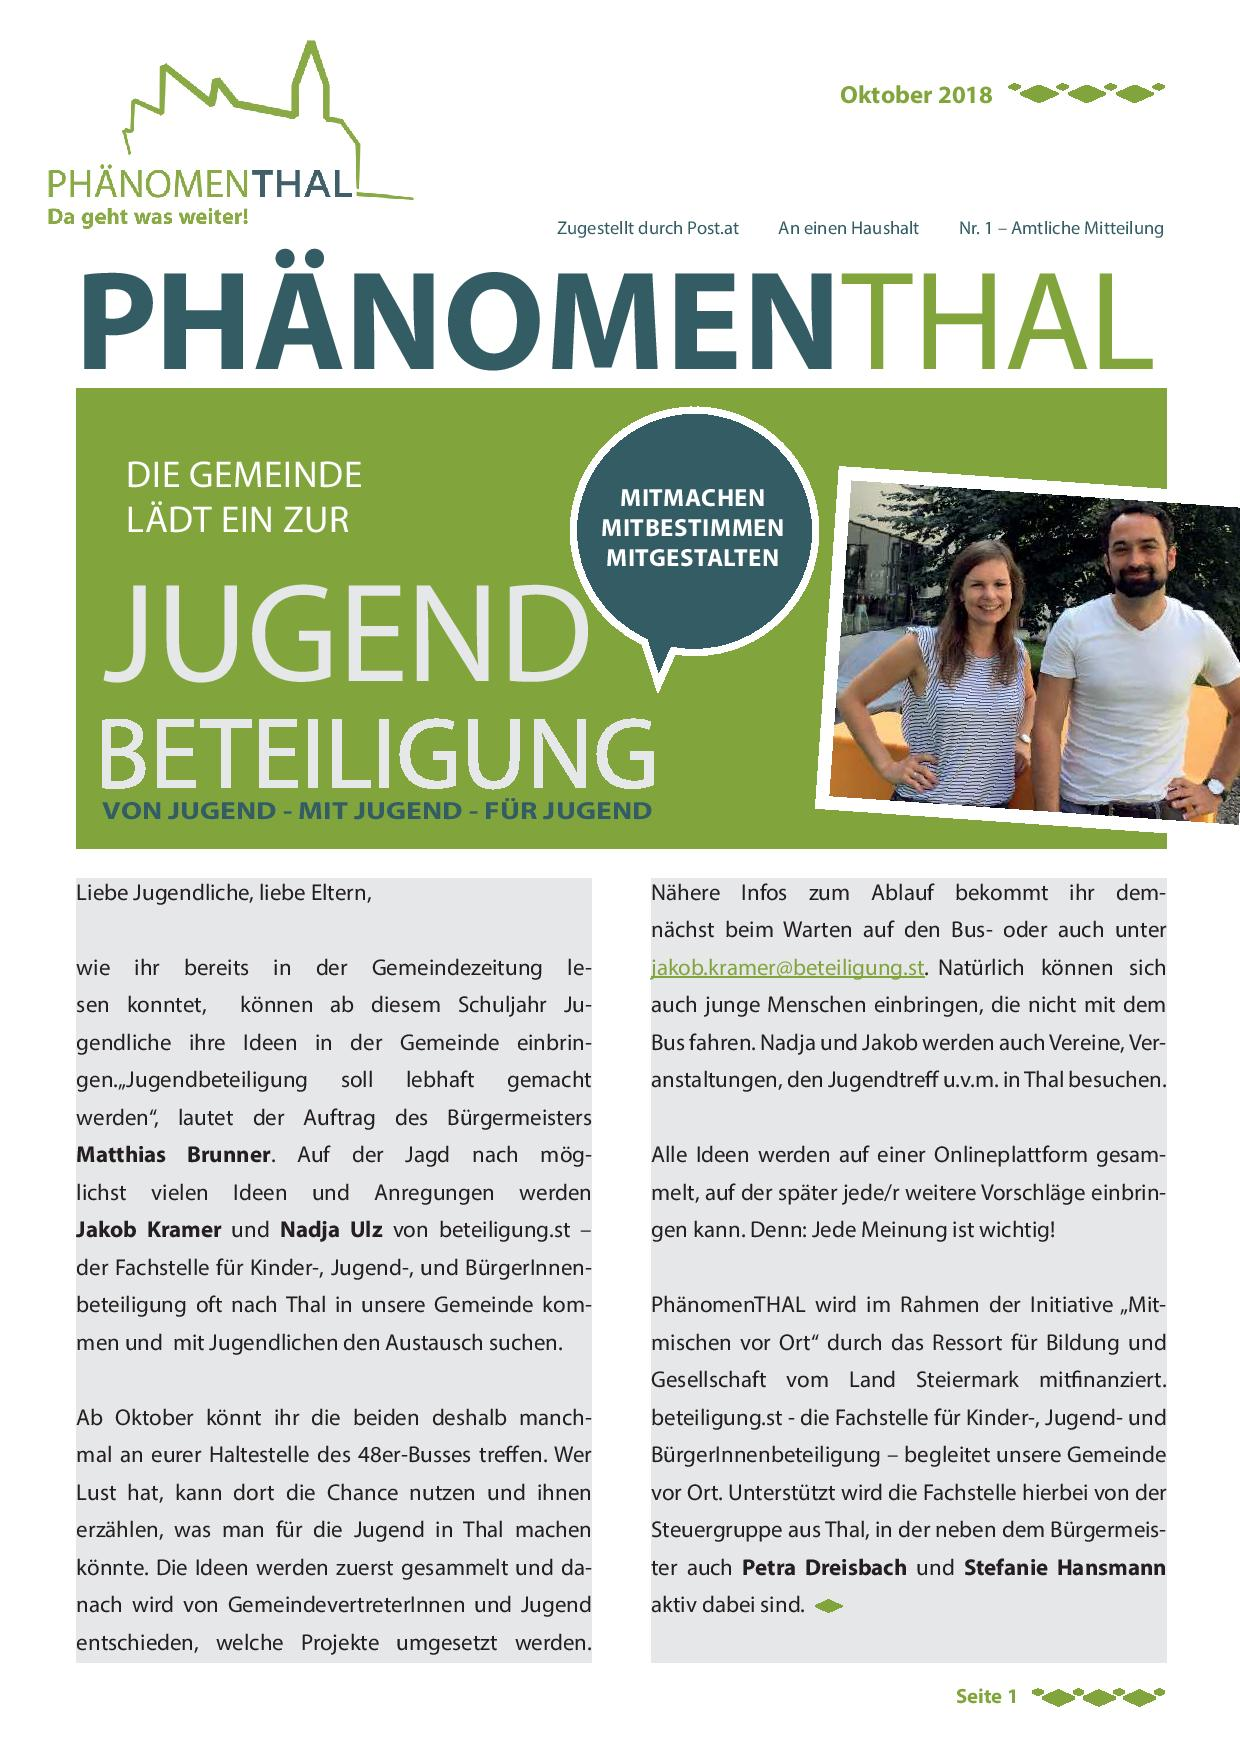 Phänomen Thal Postwurf-page-001